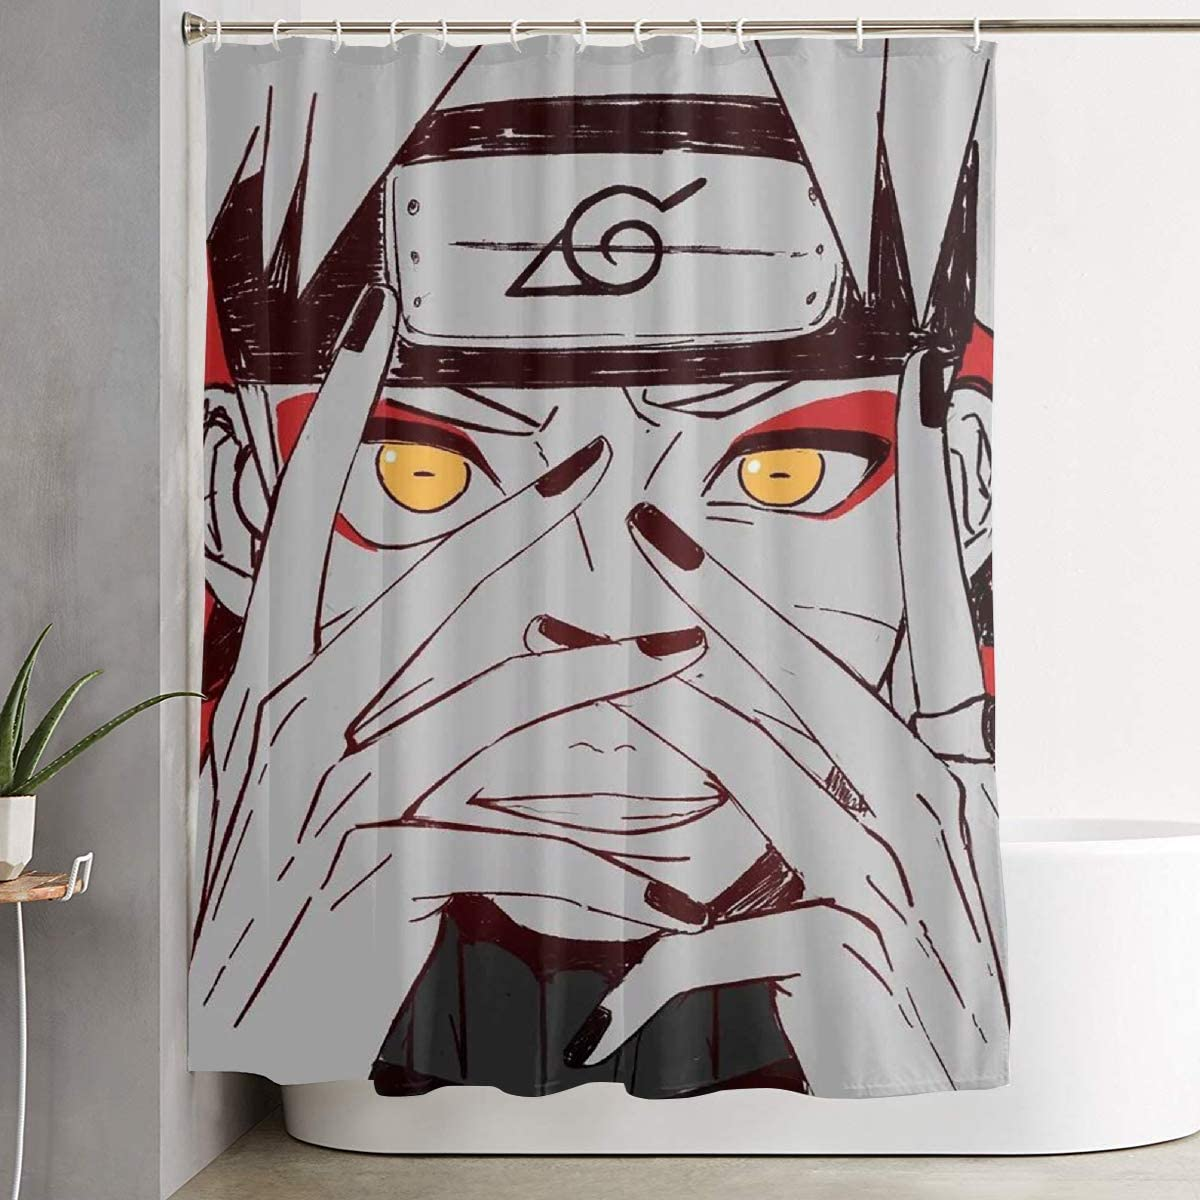 Pooizsdzzz Shower Curtain with Hook - Naruto Uzumaki Akatsuki Waterproof Polyester Fabric Bathroom Decor 60 X 72 Inches